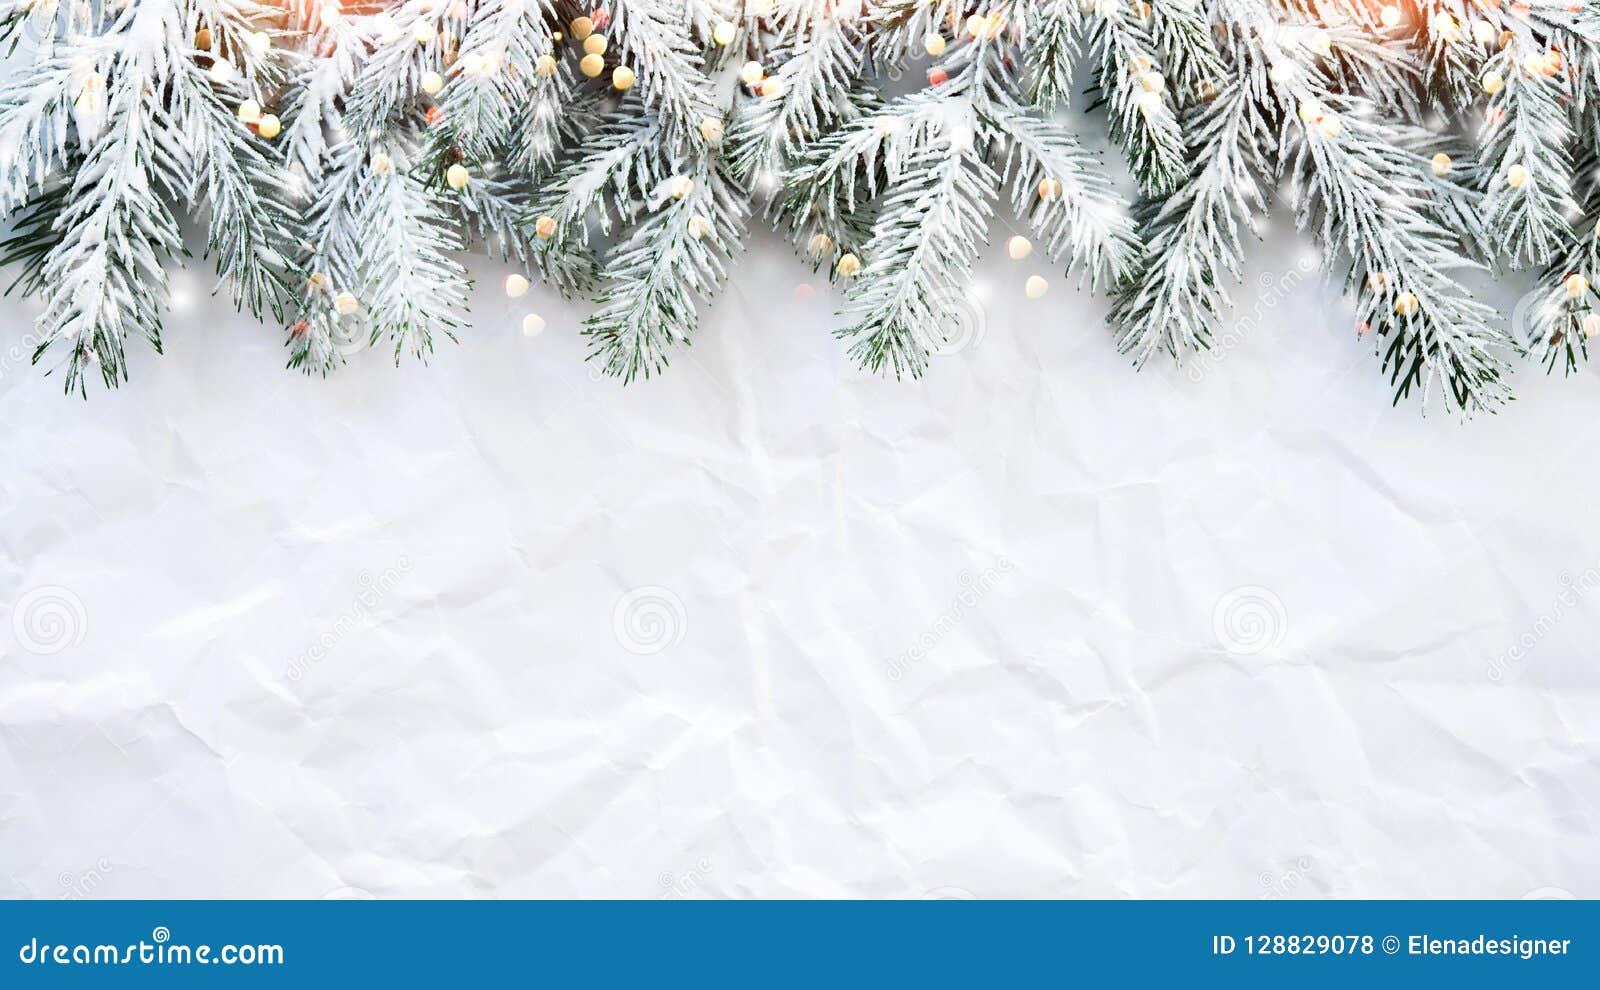 Christmas Backround.Christmas And New Year Holiday Background Xmas Greeting